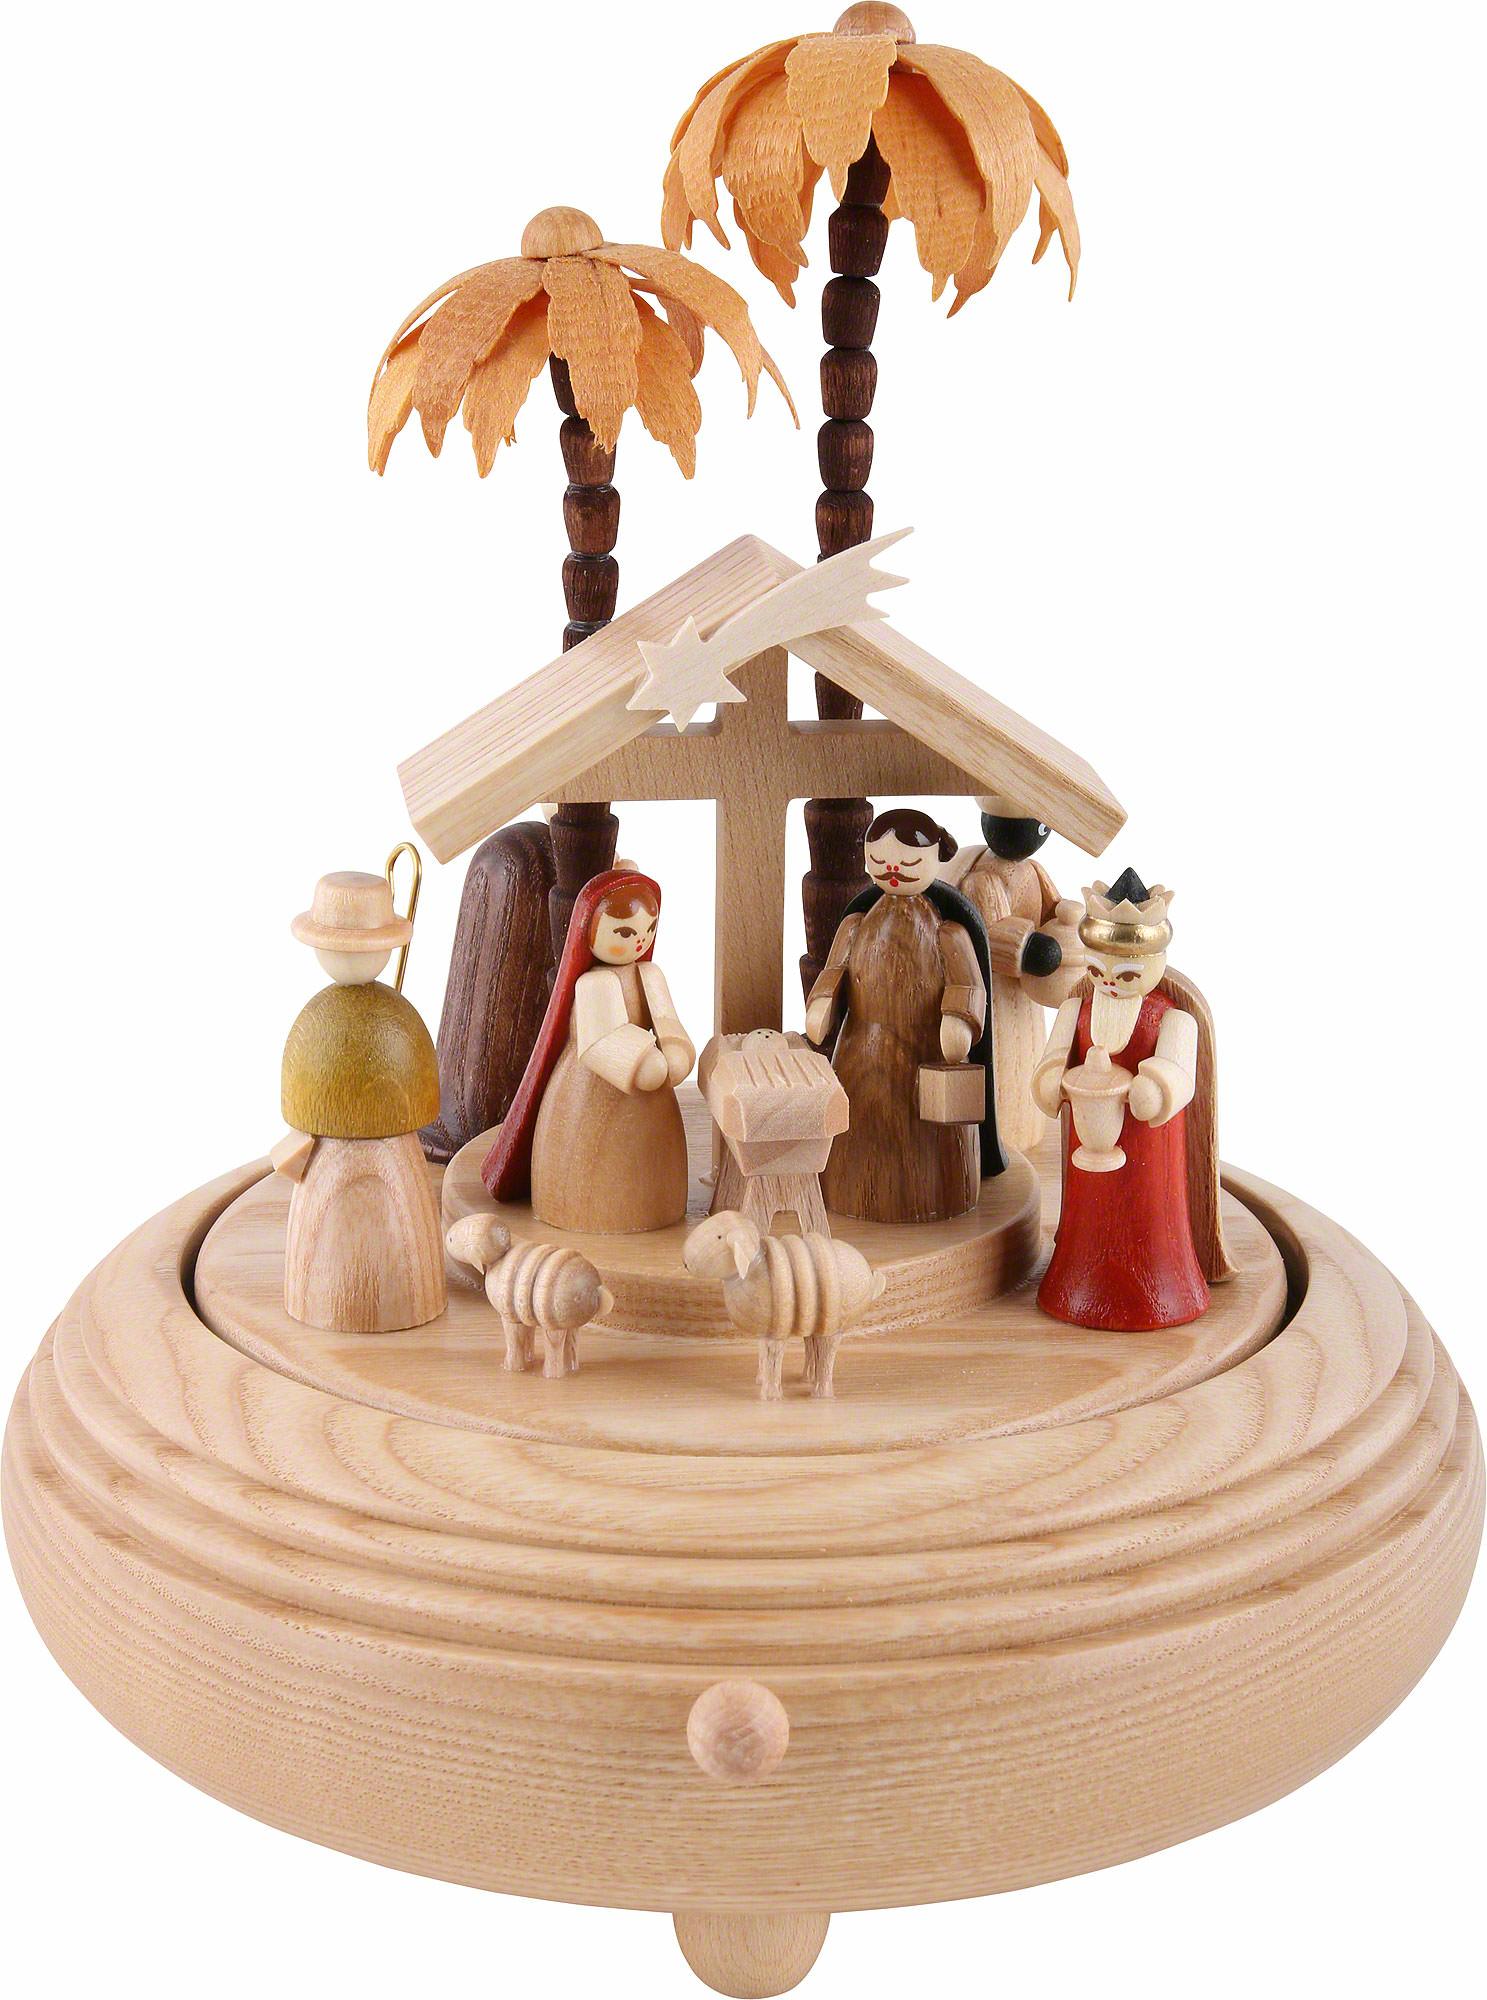 Music Box Nativity Scene Natural Wood 20 Cm 8in By Richard Glässer